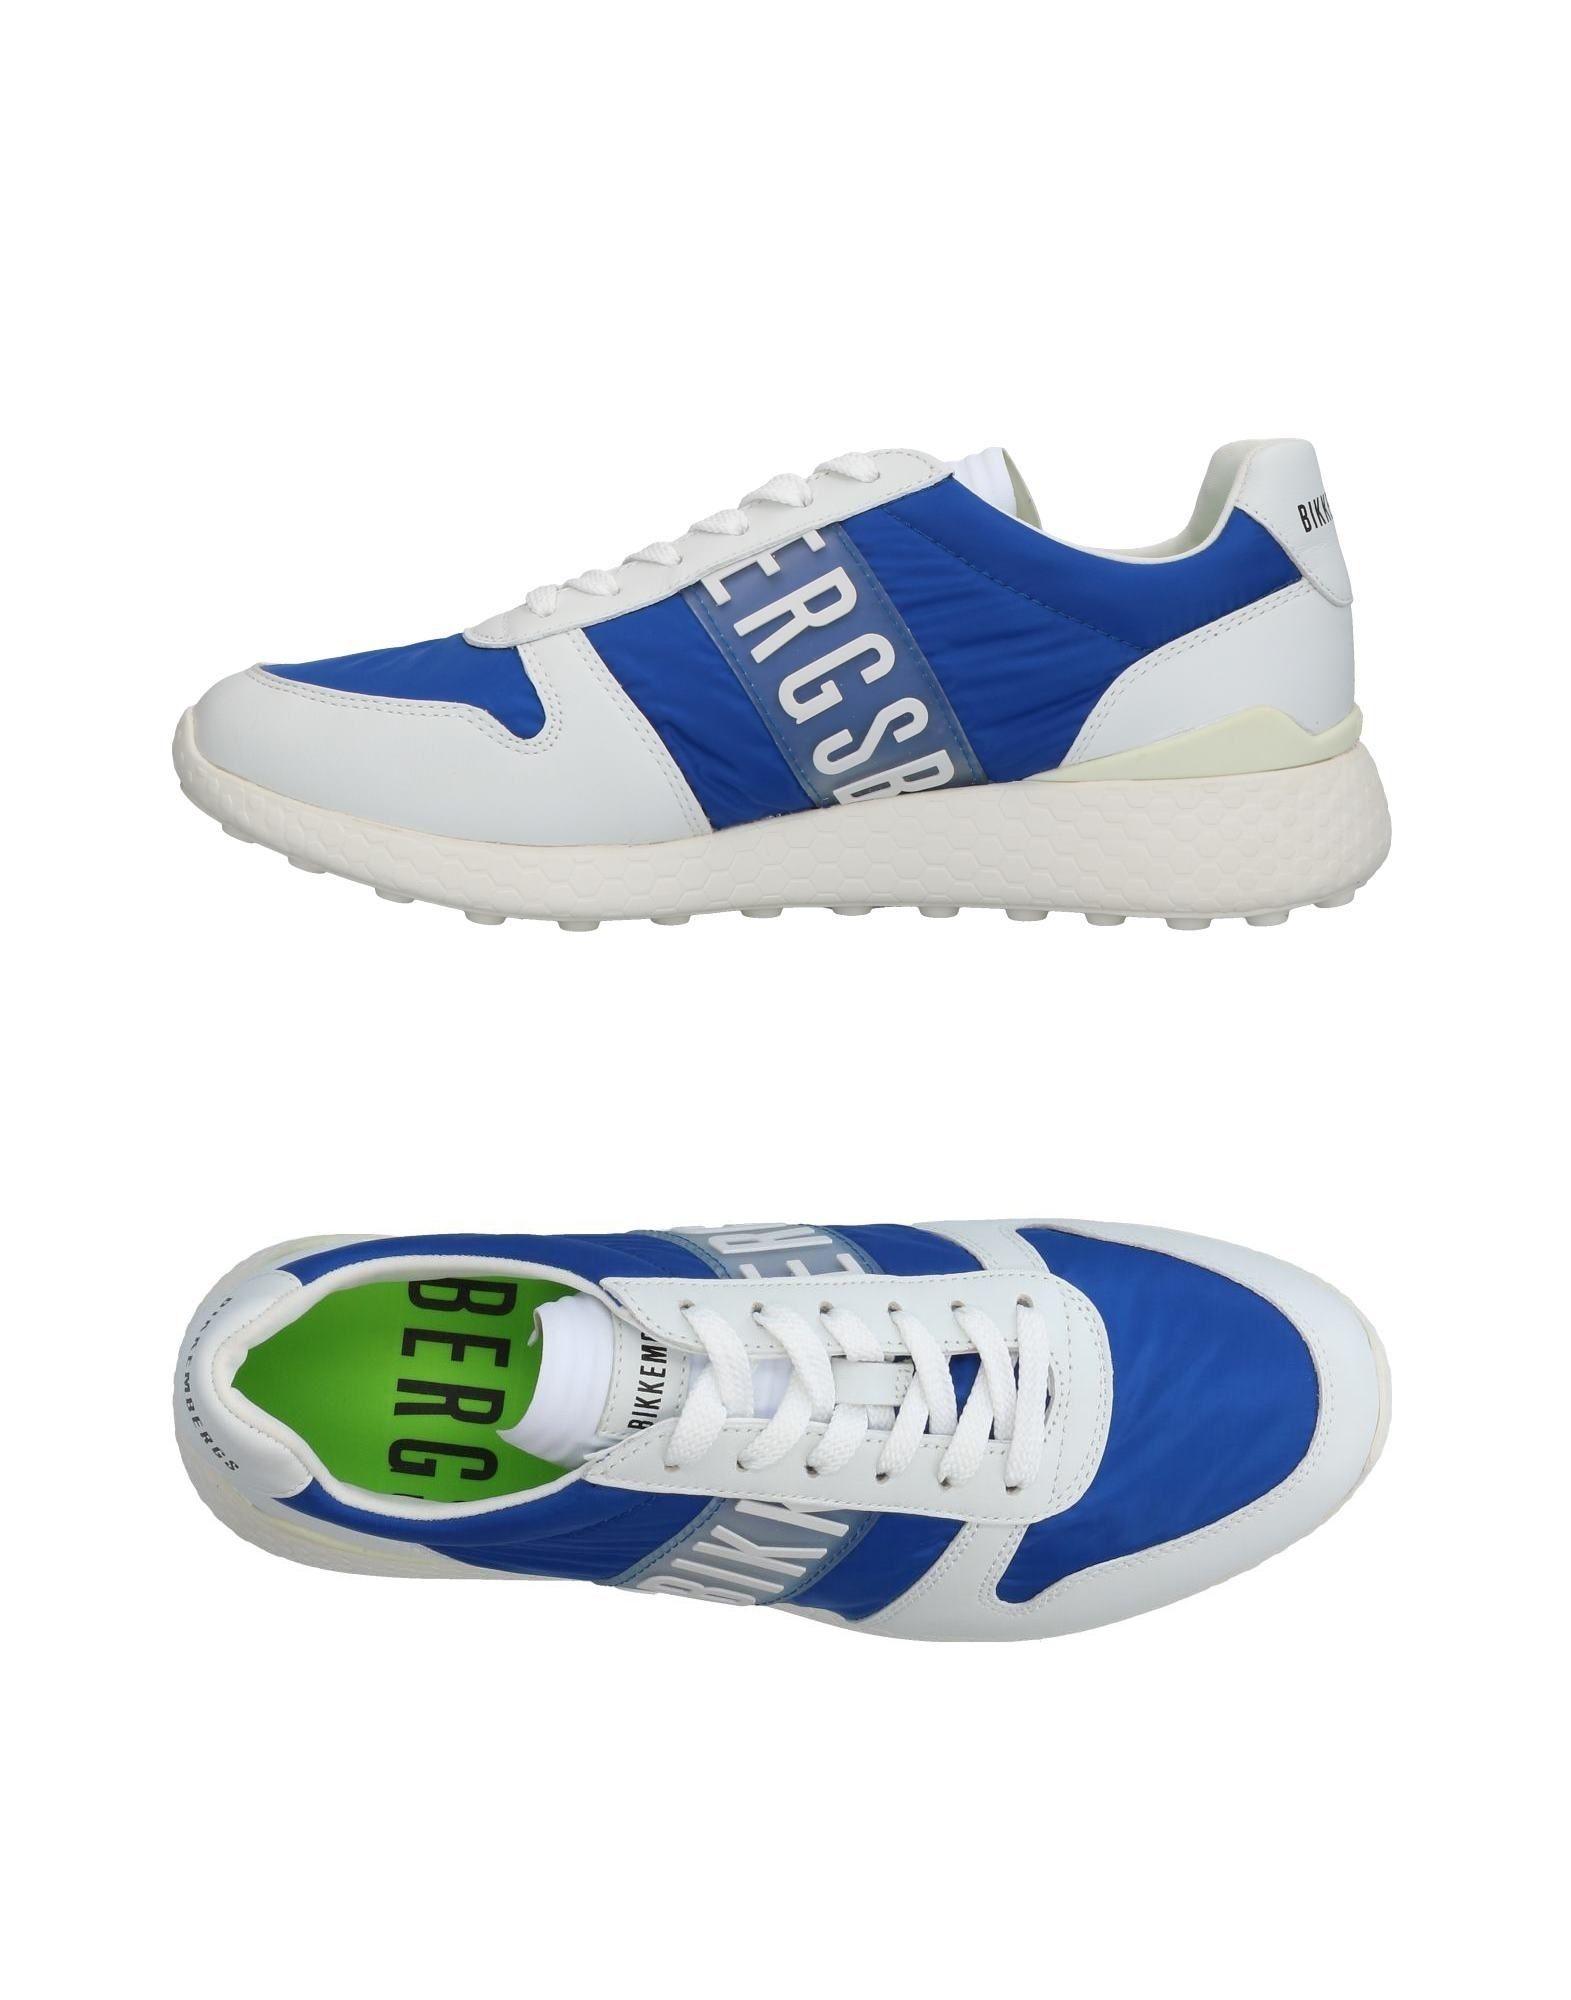 Moda Sneakers Bikkembergs Uomo Uomo Bikkembergs - 11326230WA 0bdd16